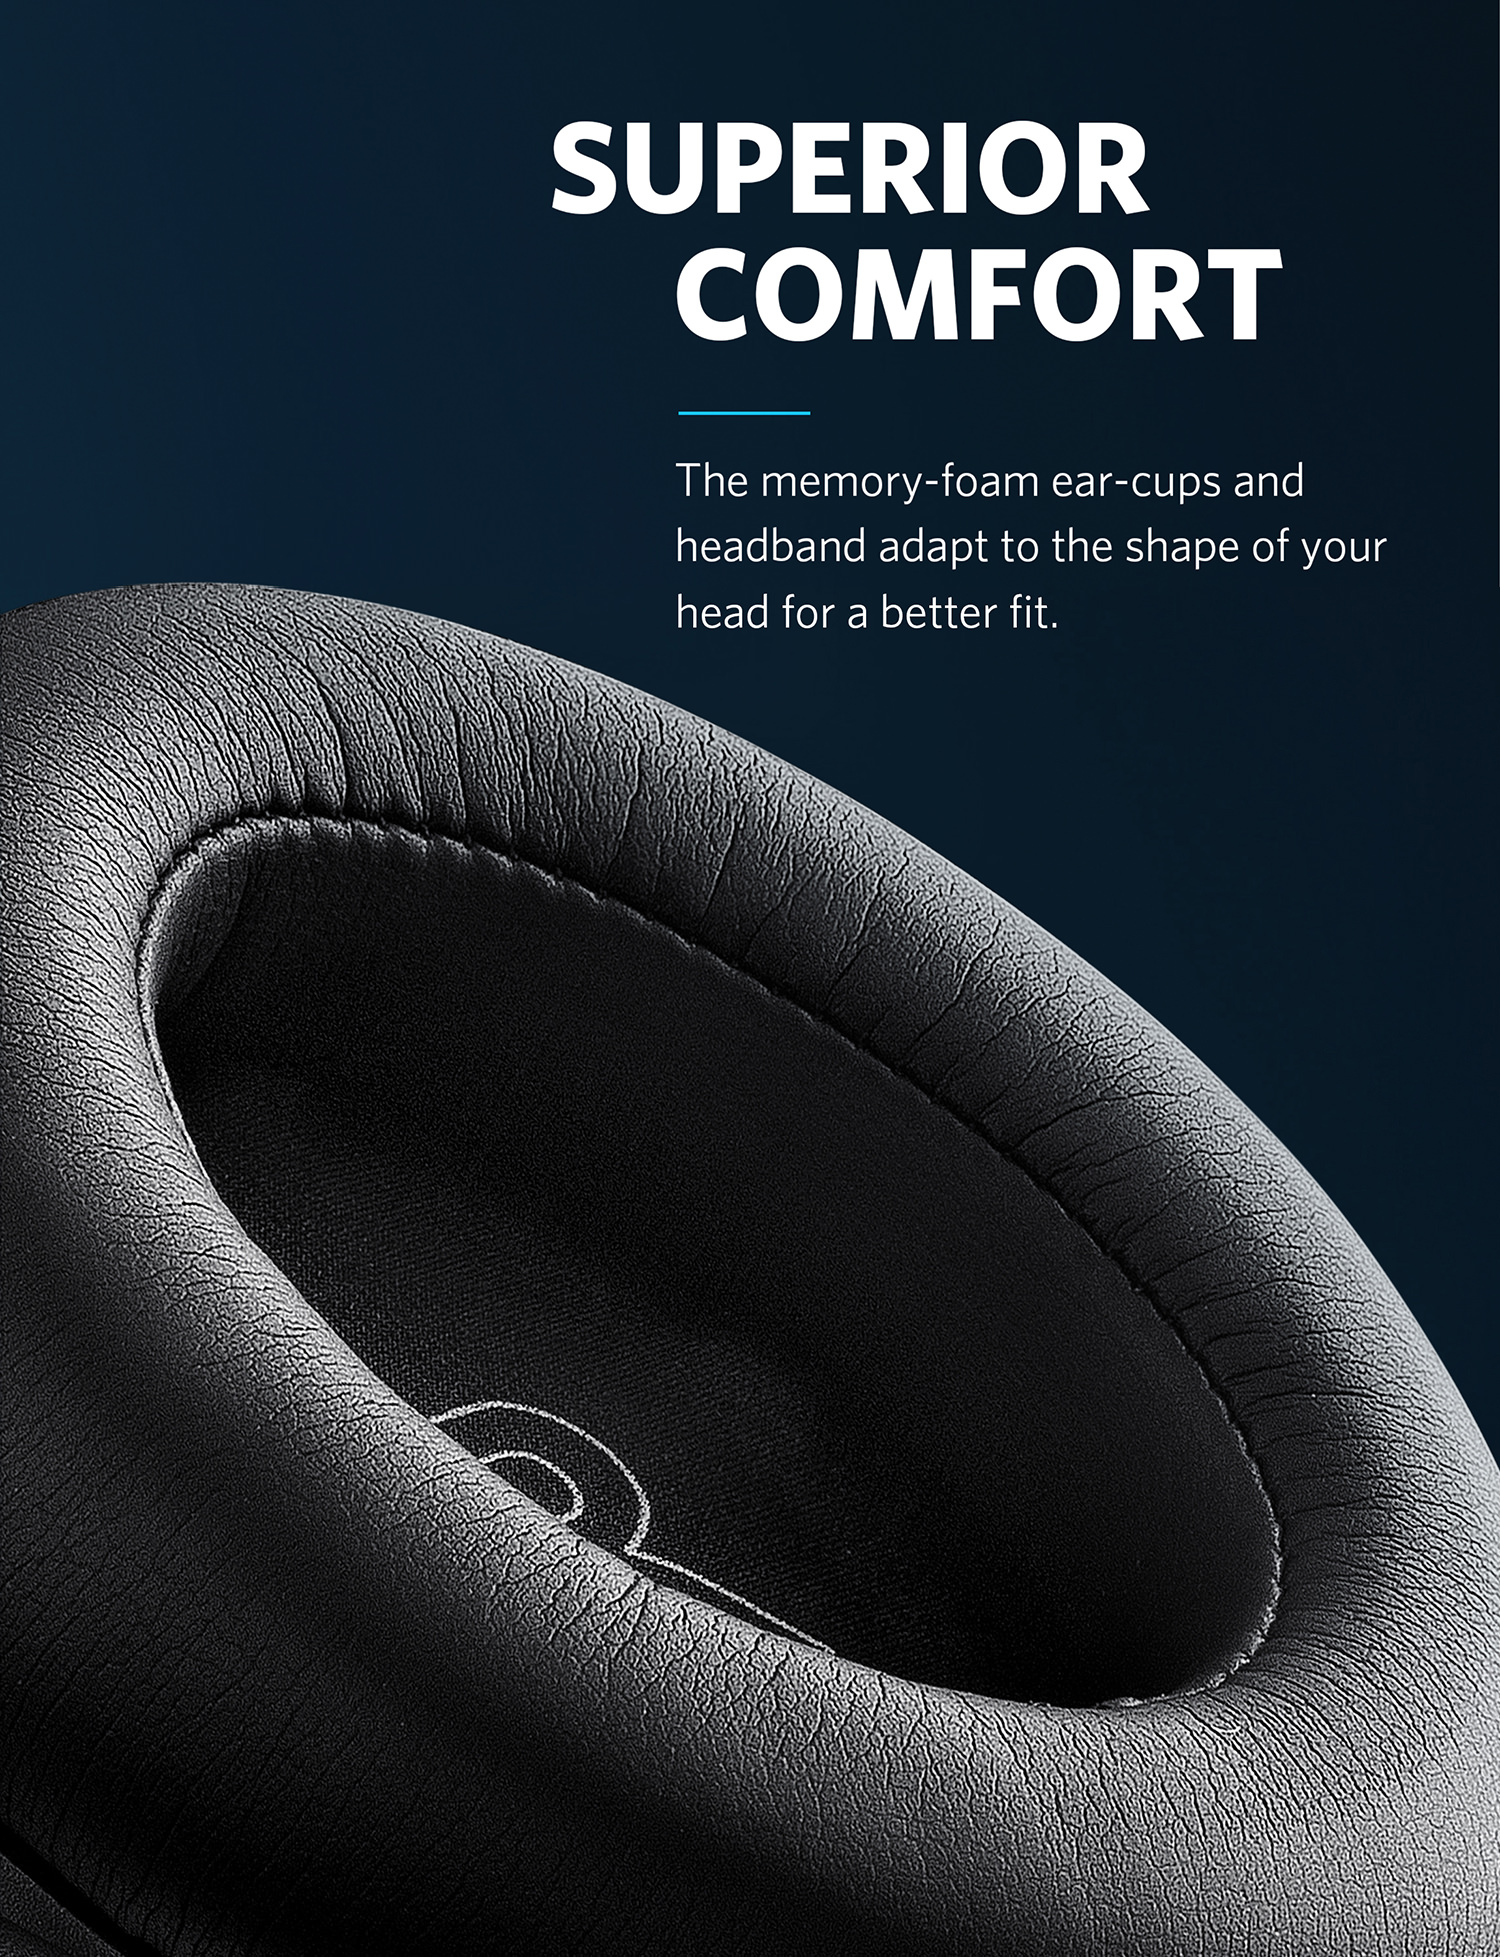 Anker、ノイズキャンセリング機能搭載ワイヤレスヘッドホン「Soundcore Space NC」を発売開始